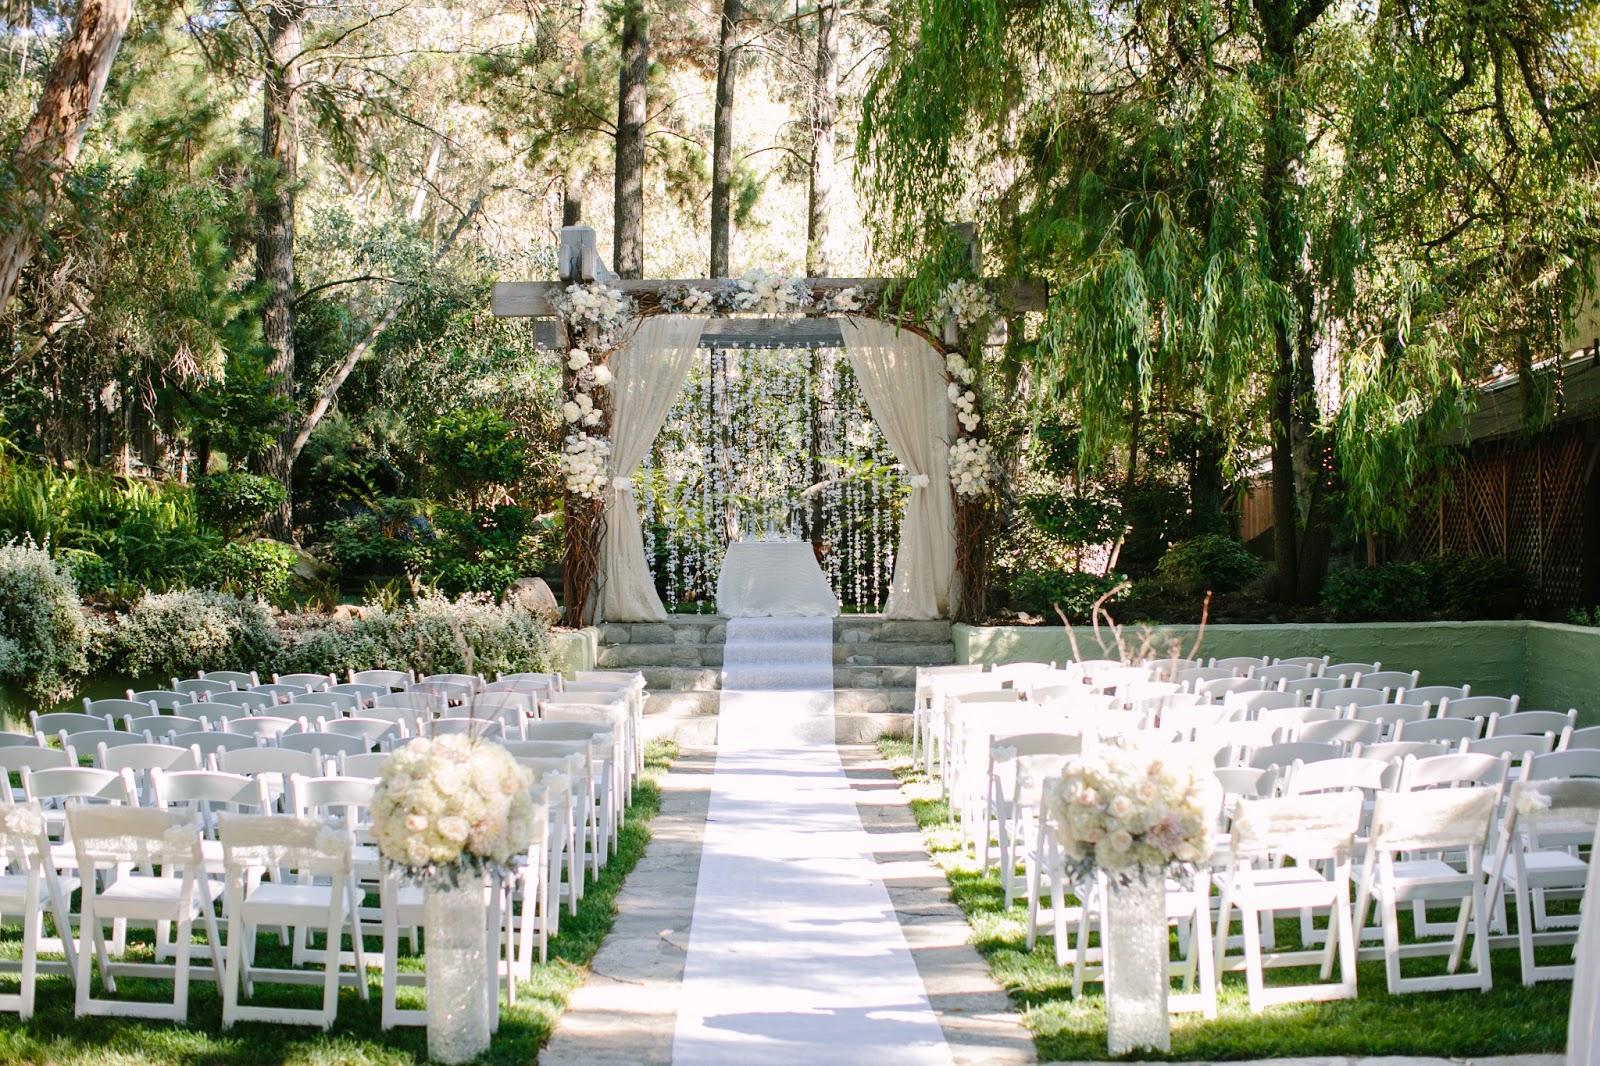 Top Romantic Wedding Venues in Southern California